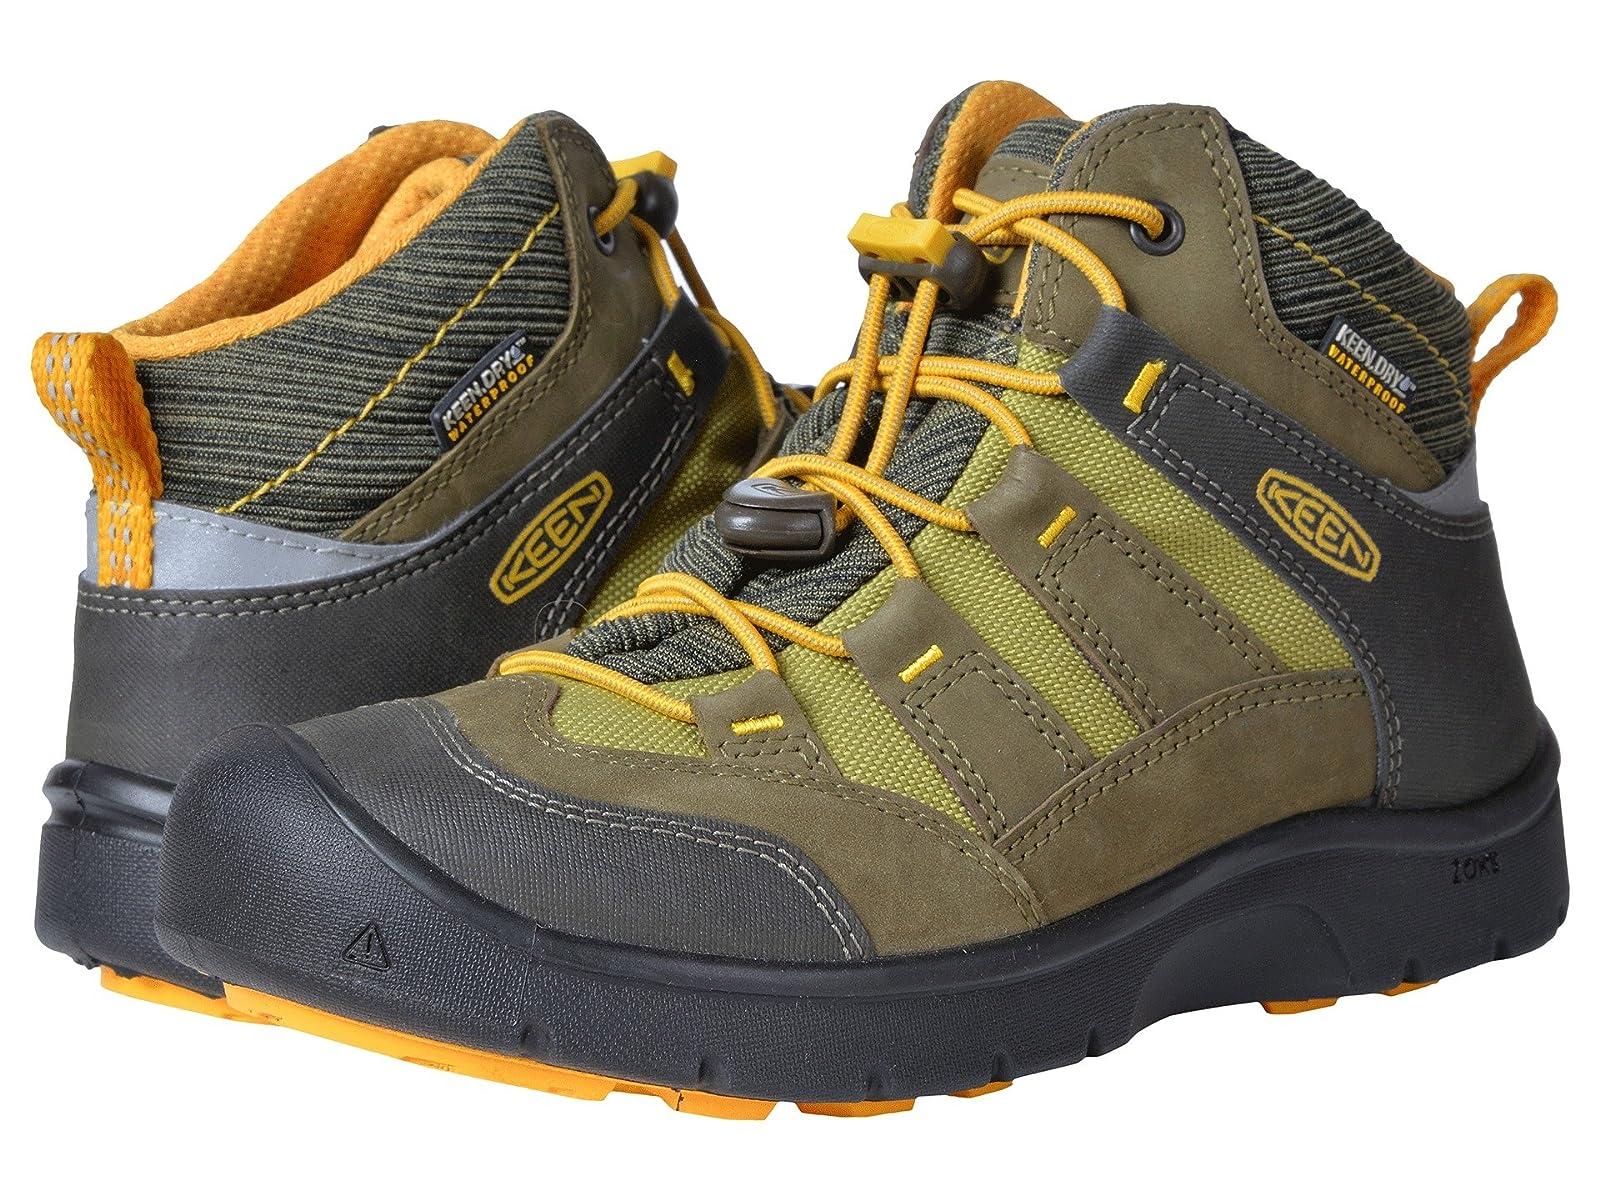 Keen Kids Hikeport Mid WP (Little Kid/Big Kid)Affordable and distinctive shoes